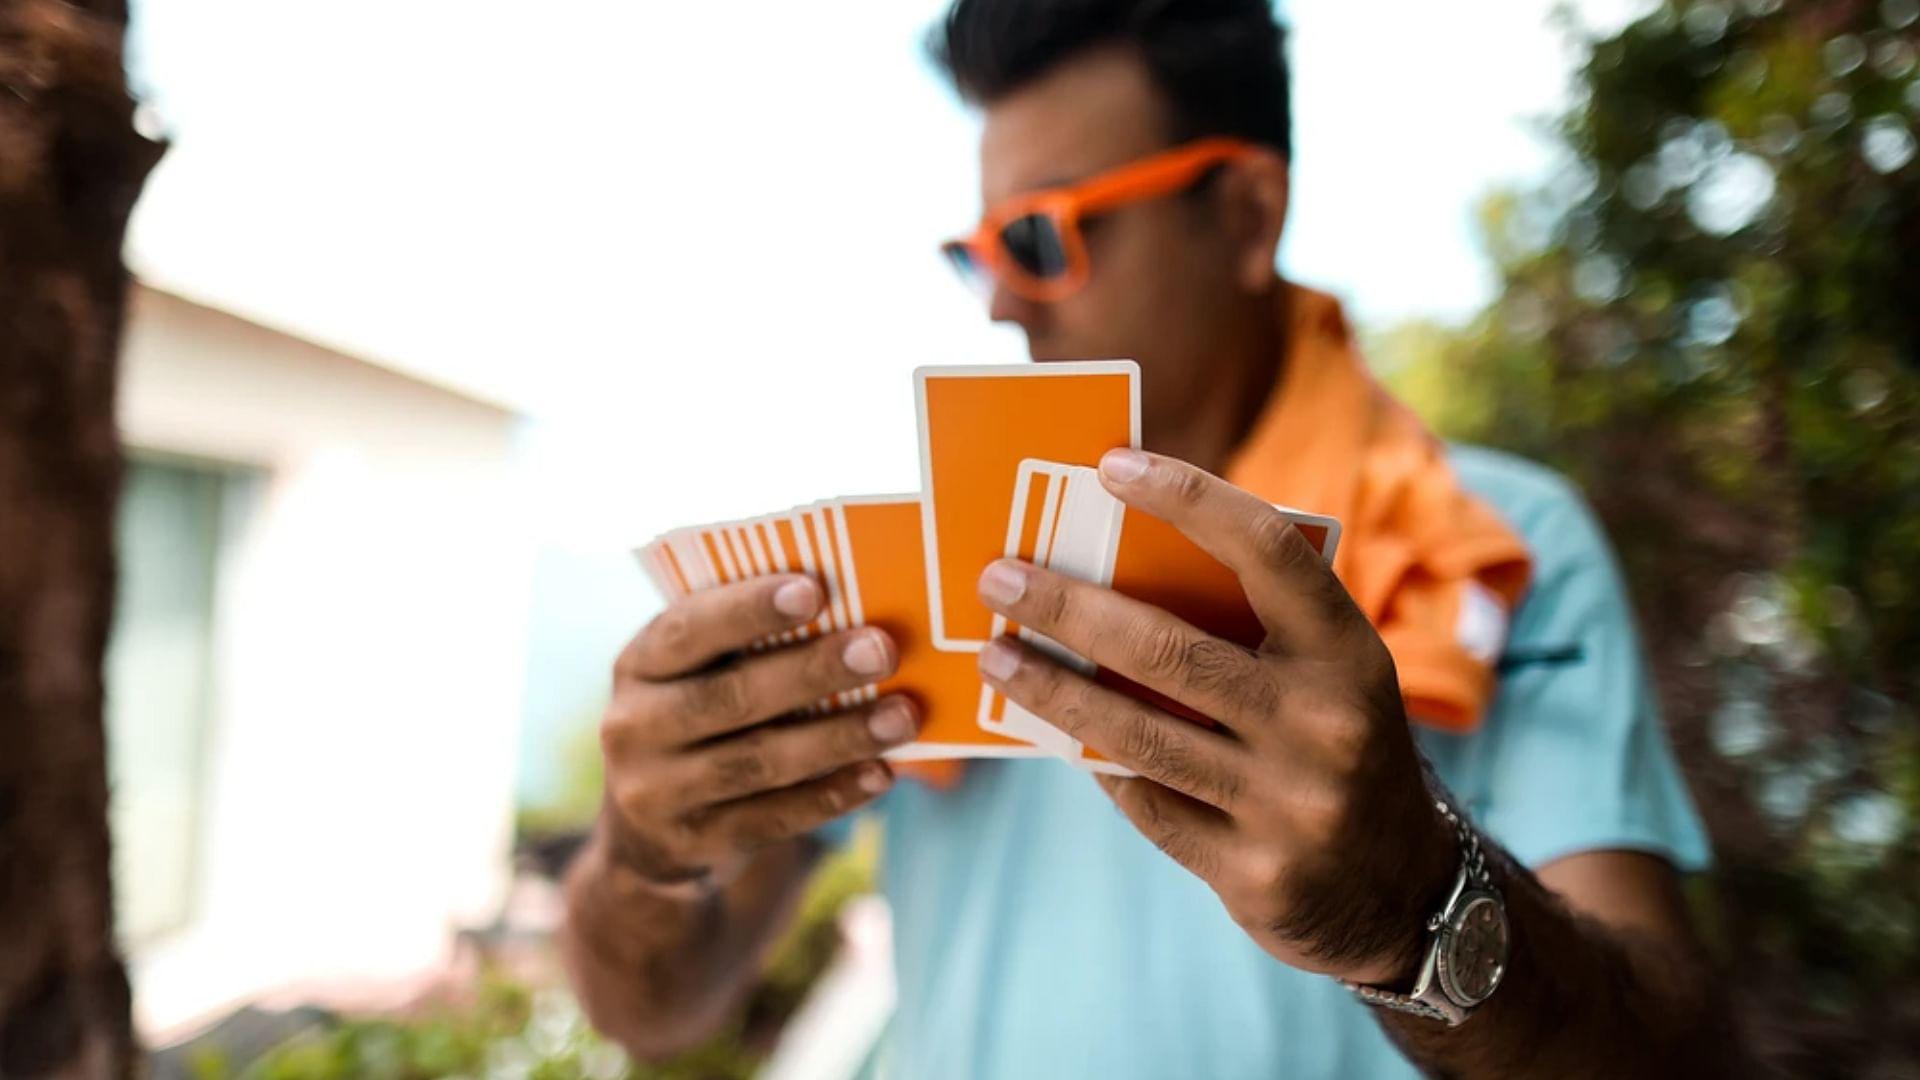 Summer NOC Orange Playing Cards